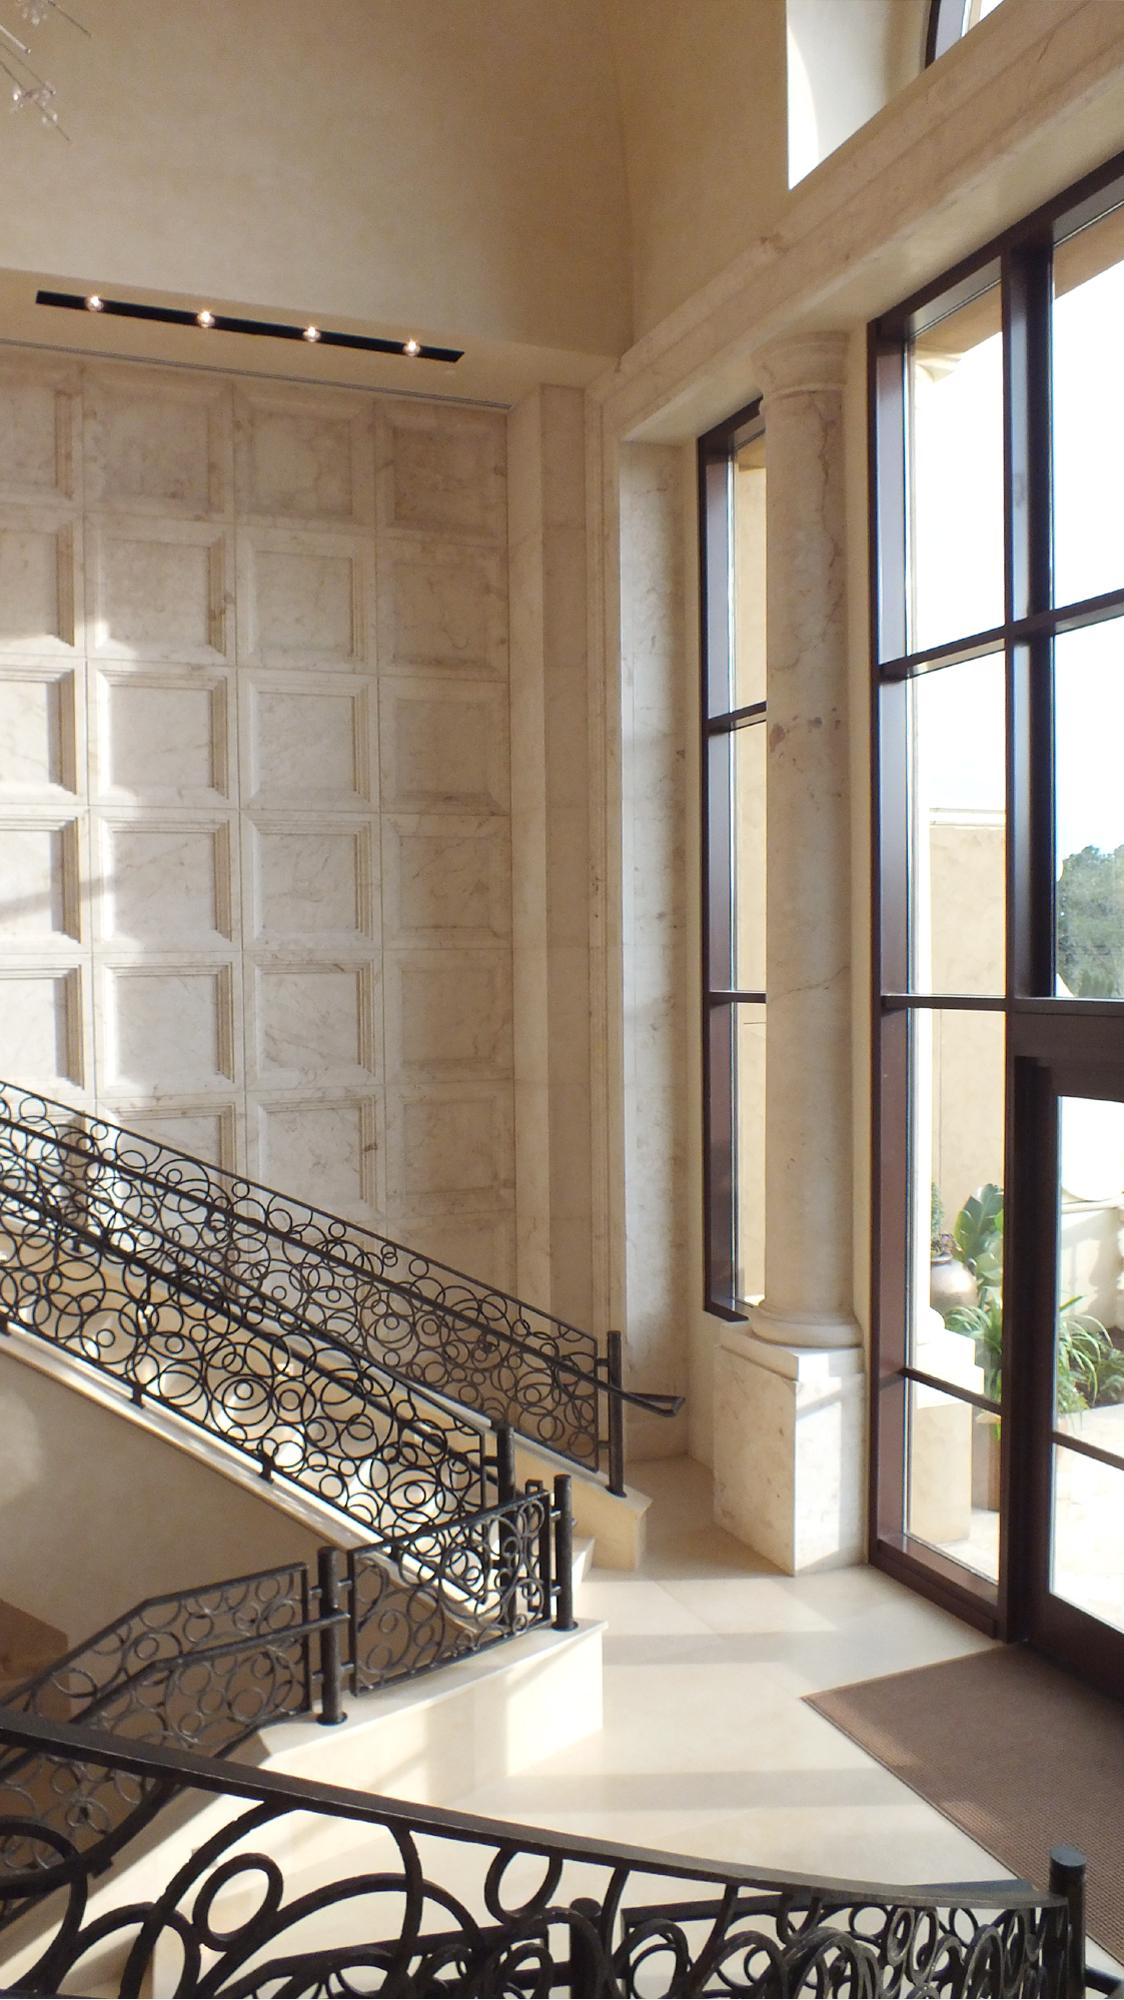 10_Coffered Wall,Pilaster,stair_1124x2000_DSCF0763.jpg